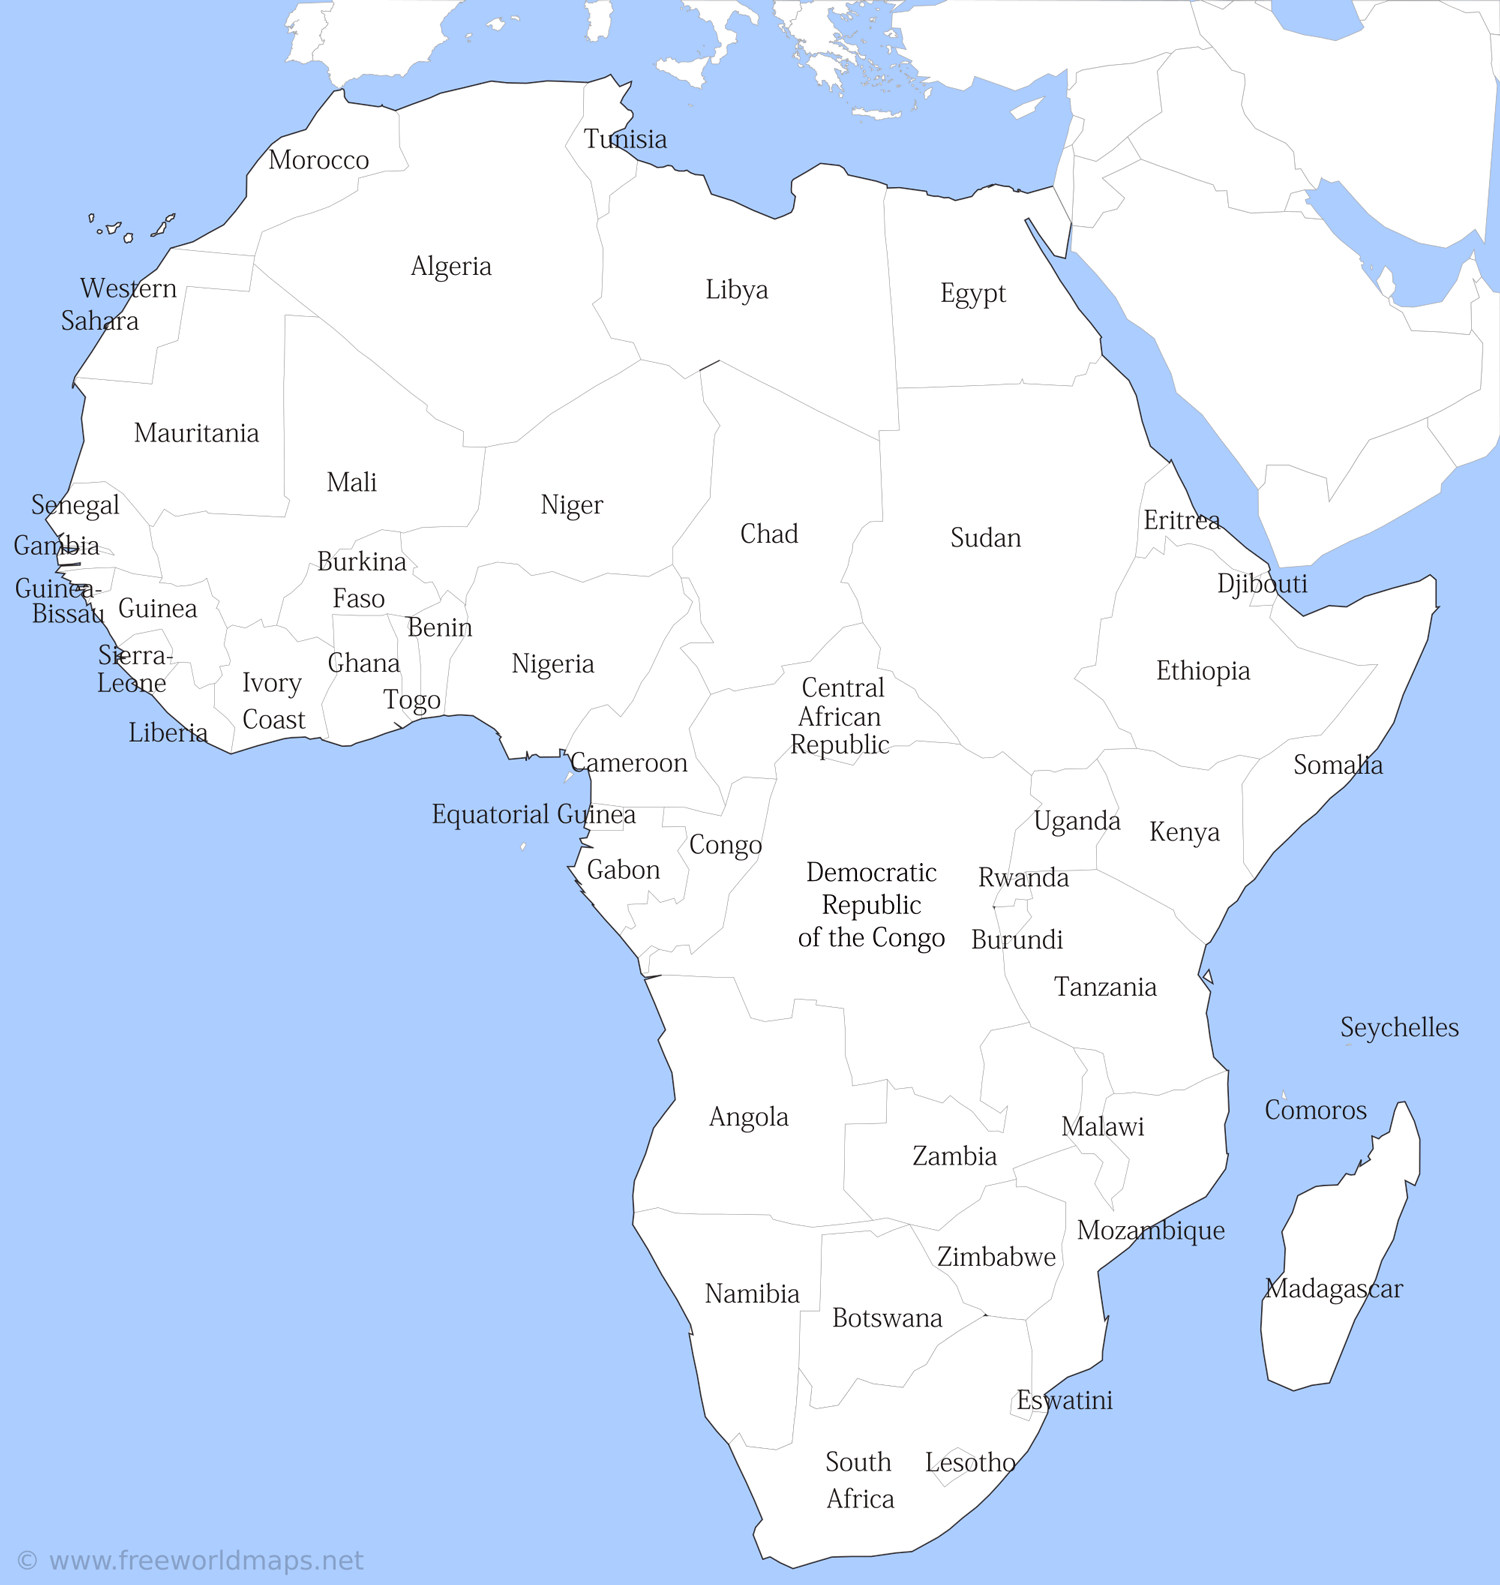 Freeworldmaps On Reddit